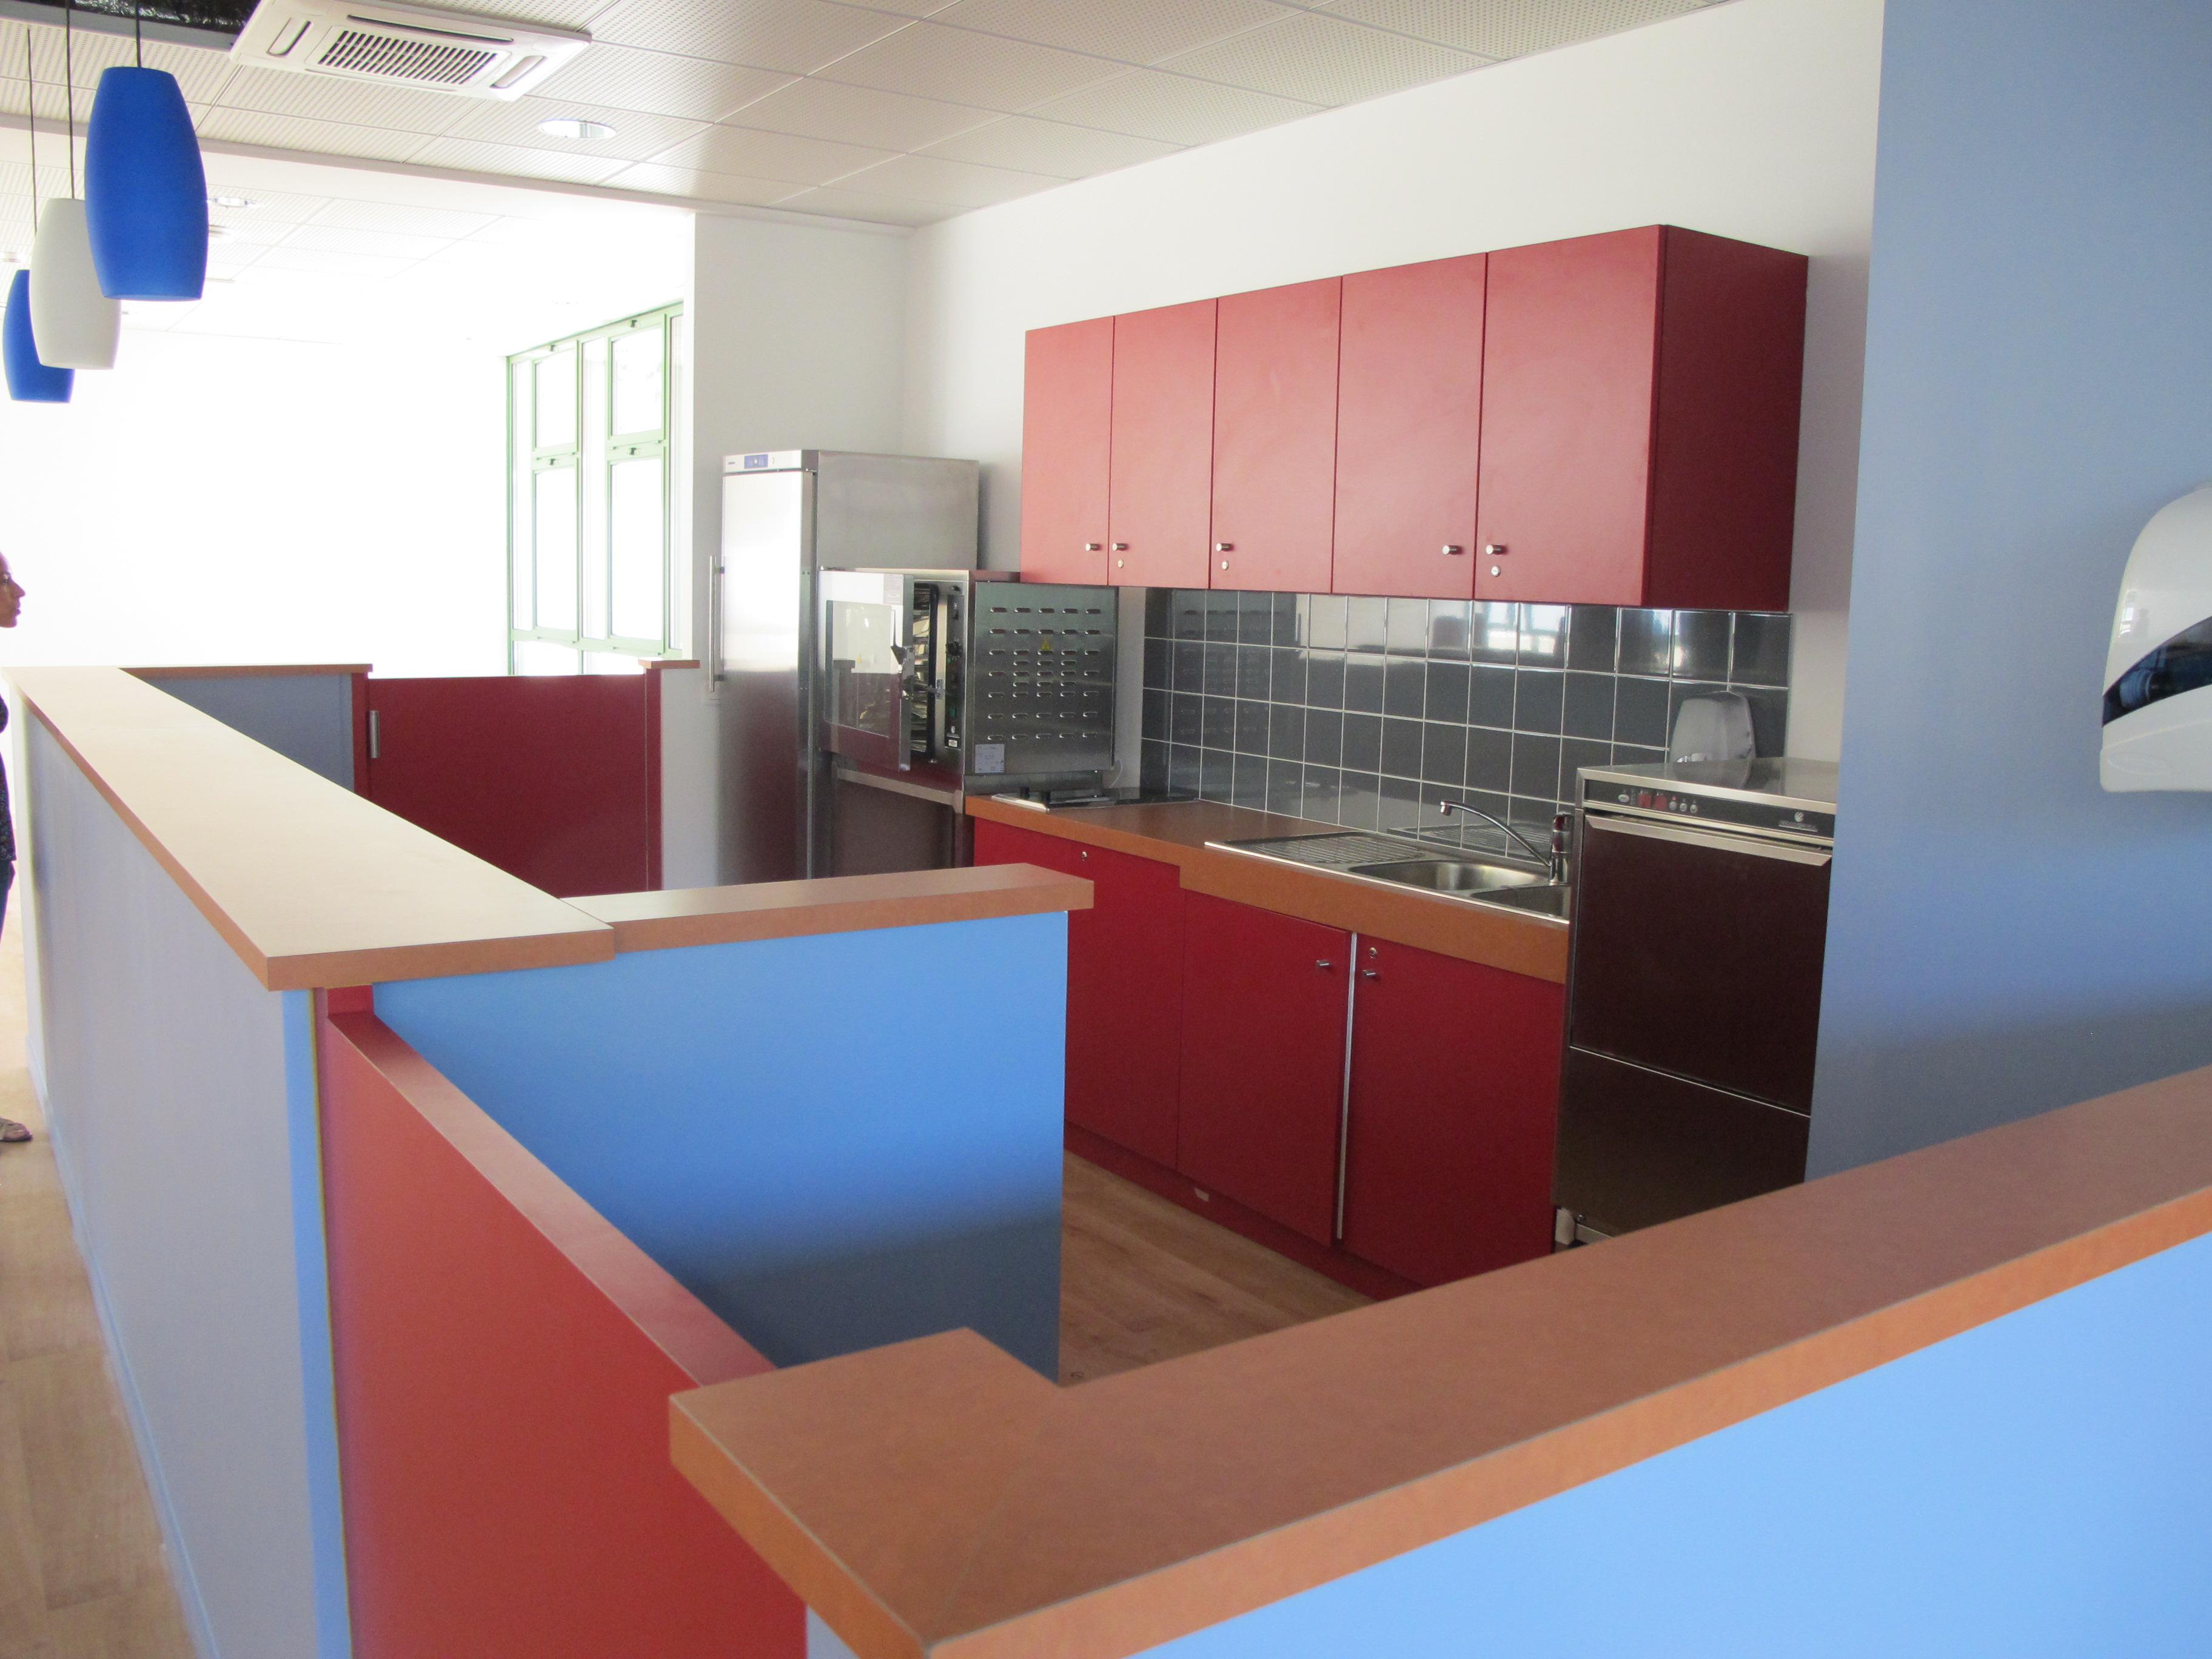 maison de retraite fontenay sous bois ventana blog. Black Bedroom Furniture Sets. Home Design Ideas